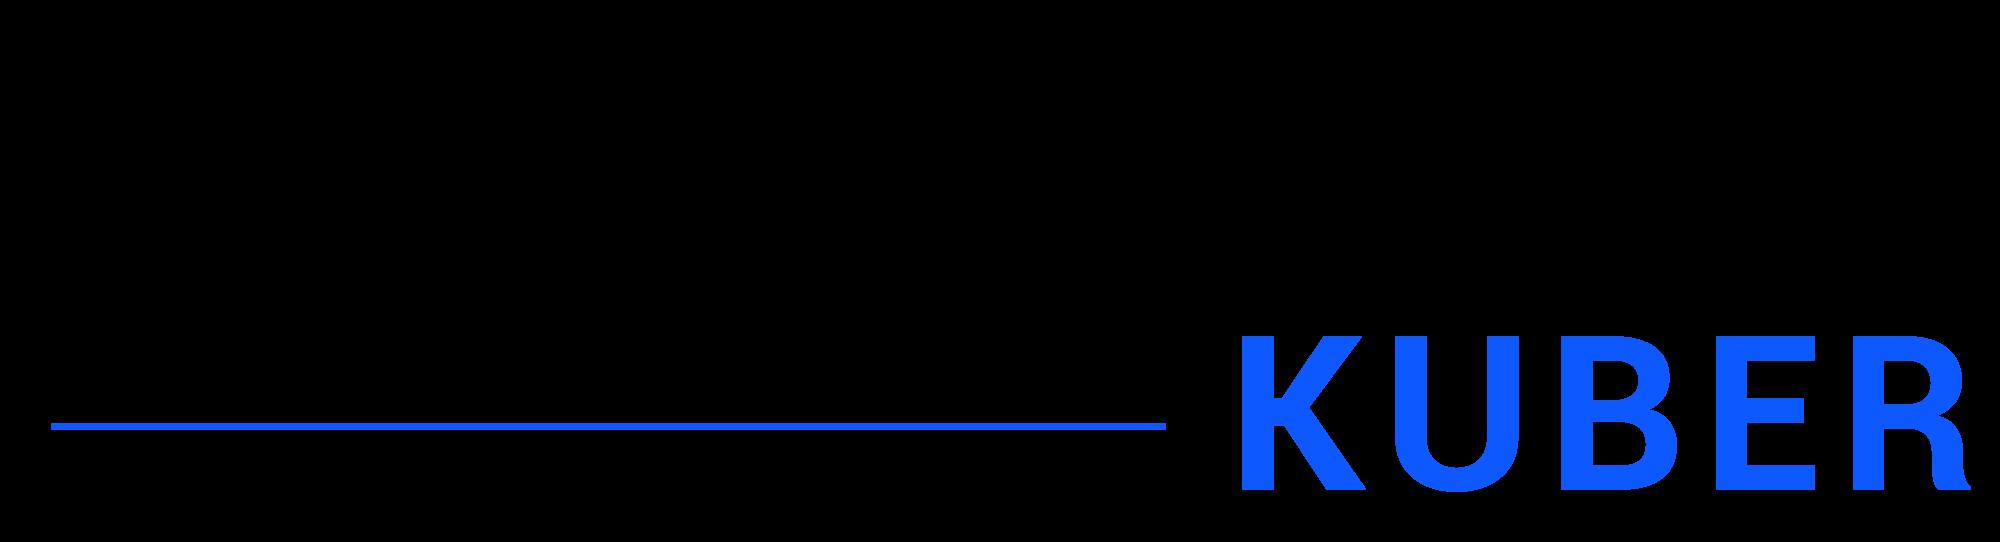 coinswitchKuber-RefreshBlue Logo 3